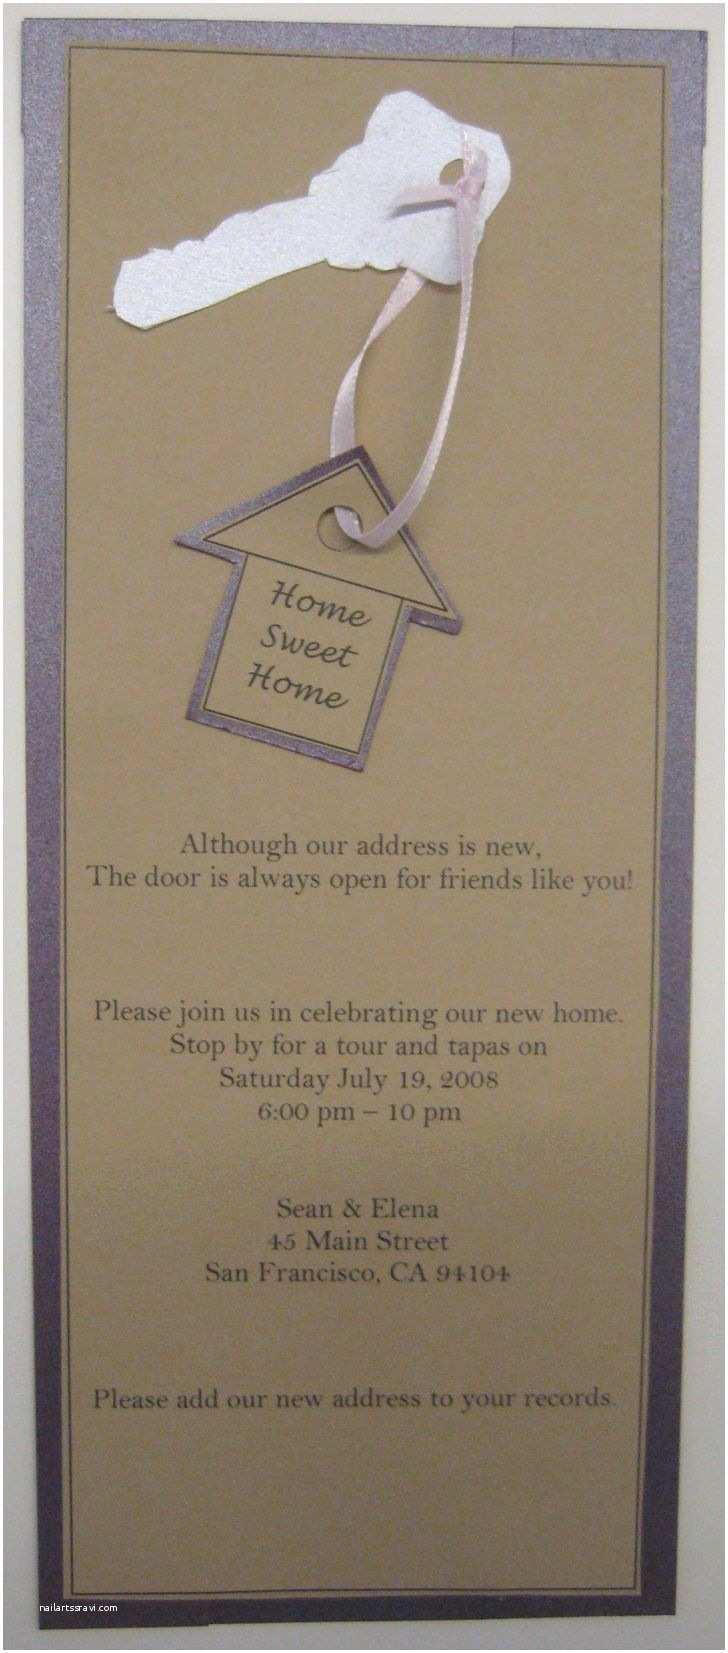 /housewarming/housewarming Invitation Ideas E Party with Me Housewarming Party — Invite